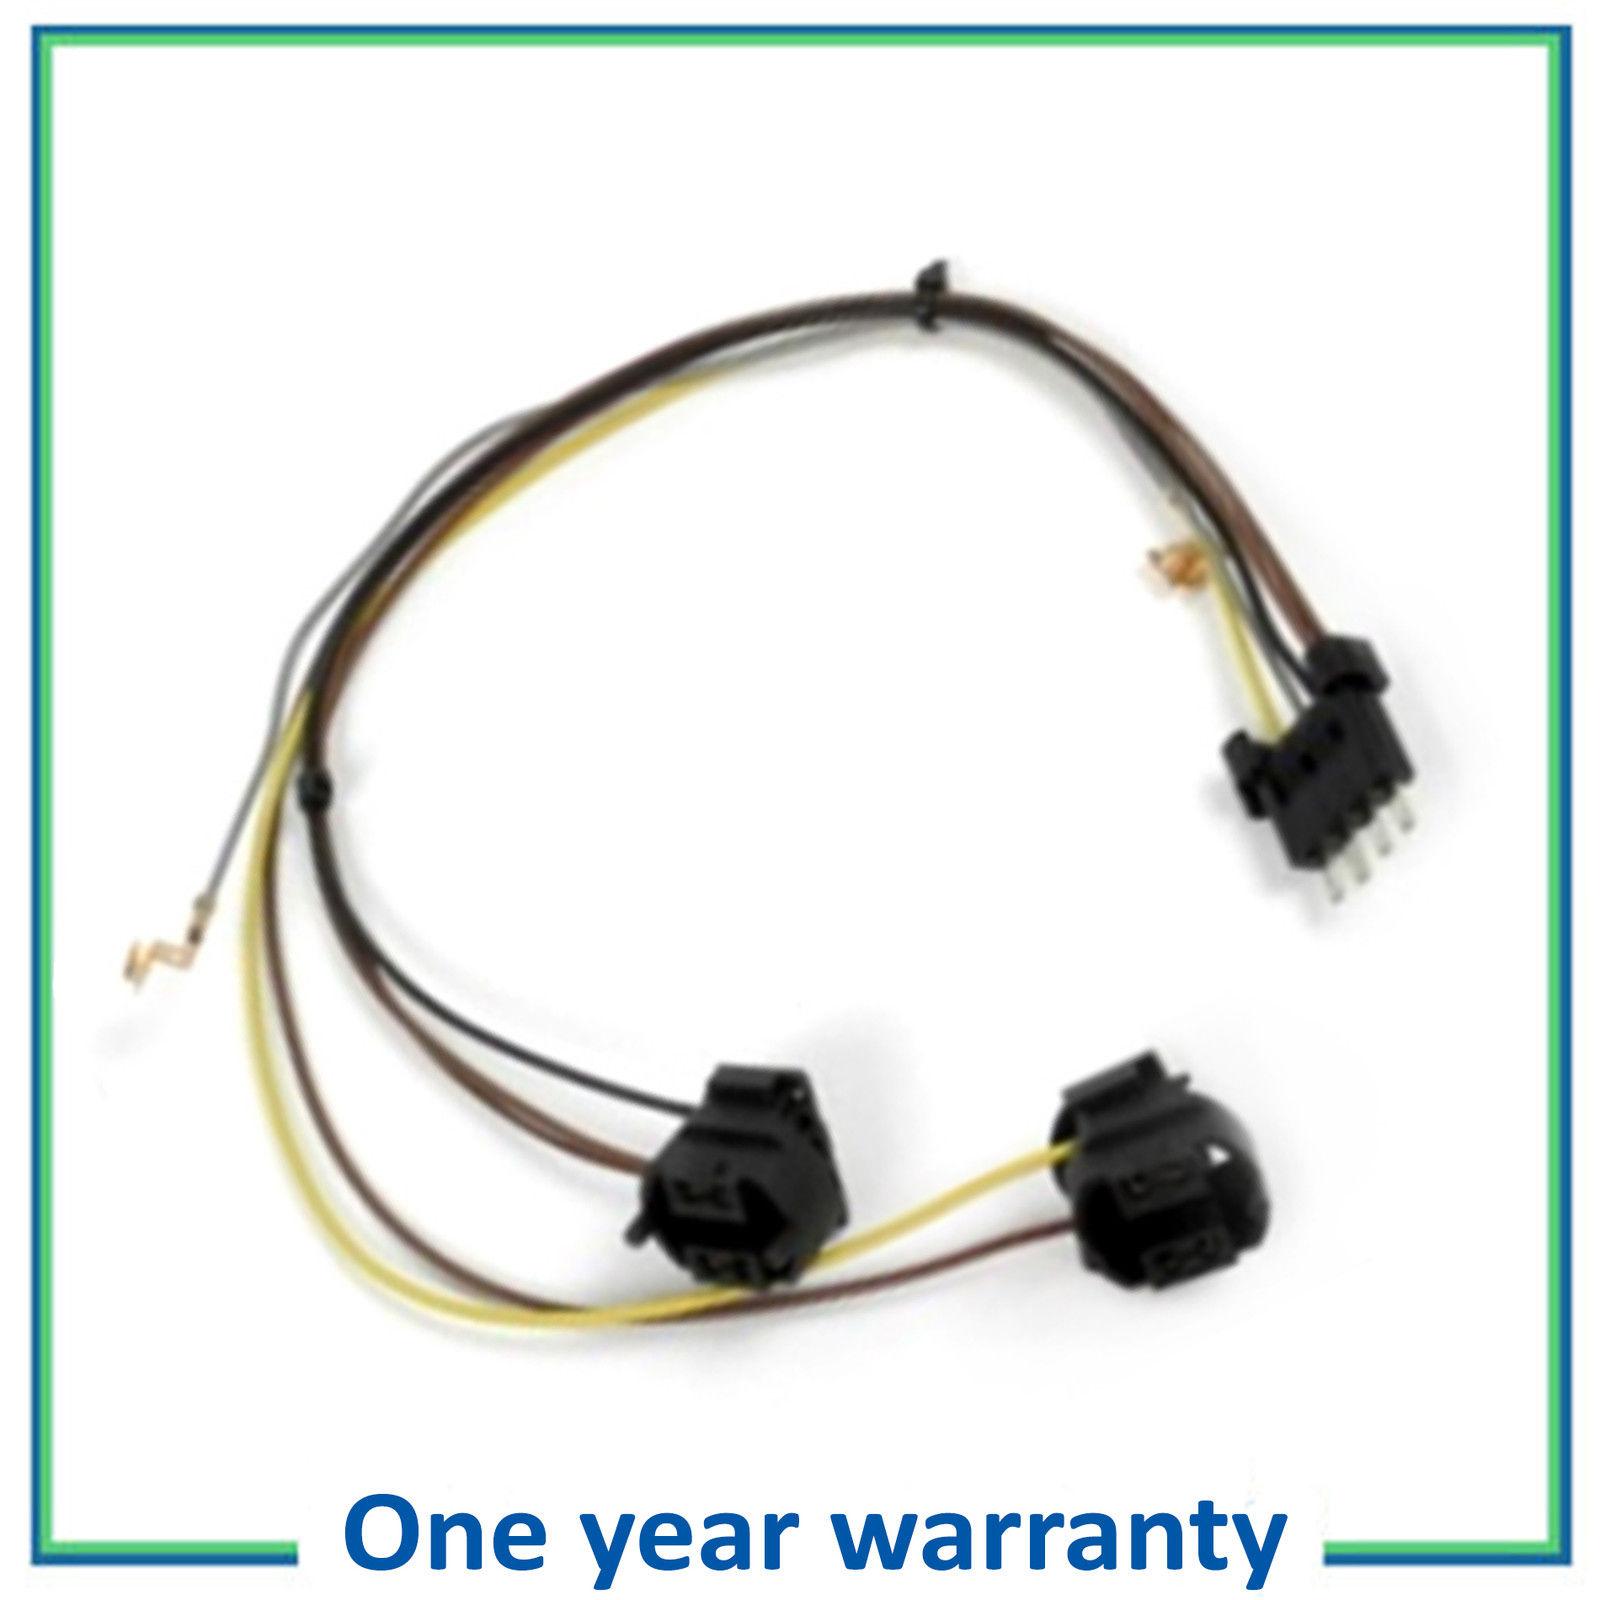 Headlightwiringharnessrepairkit - Lir Wiring 101 on bucket truck harness, heavy duty headlight harness, headlight bracket, headlight relay harness, headlight connectors,